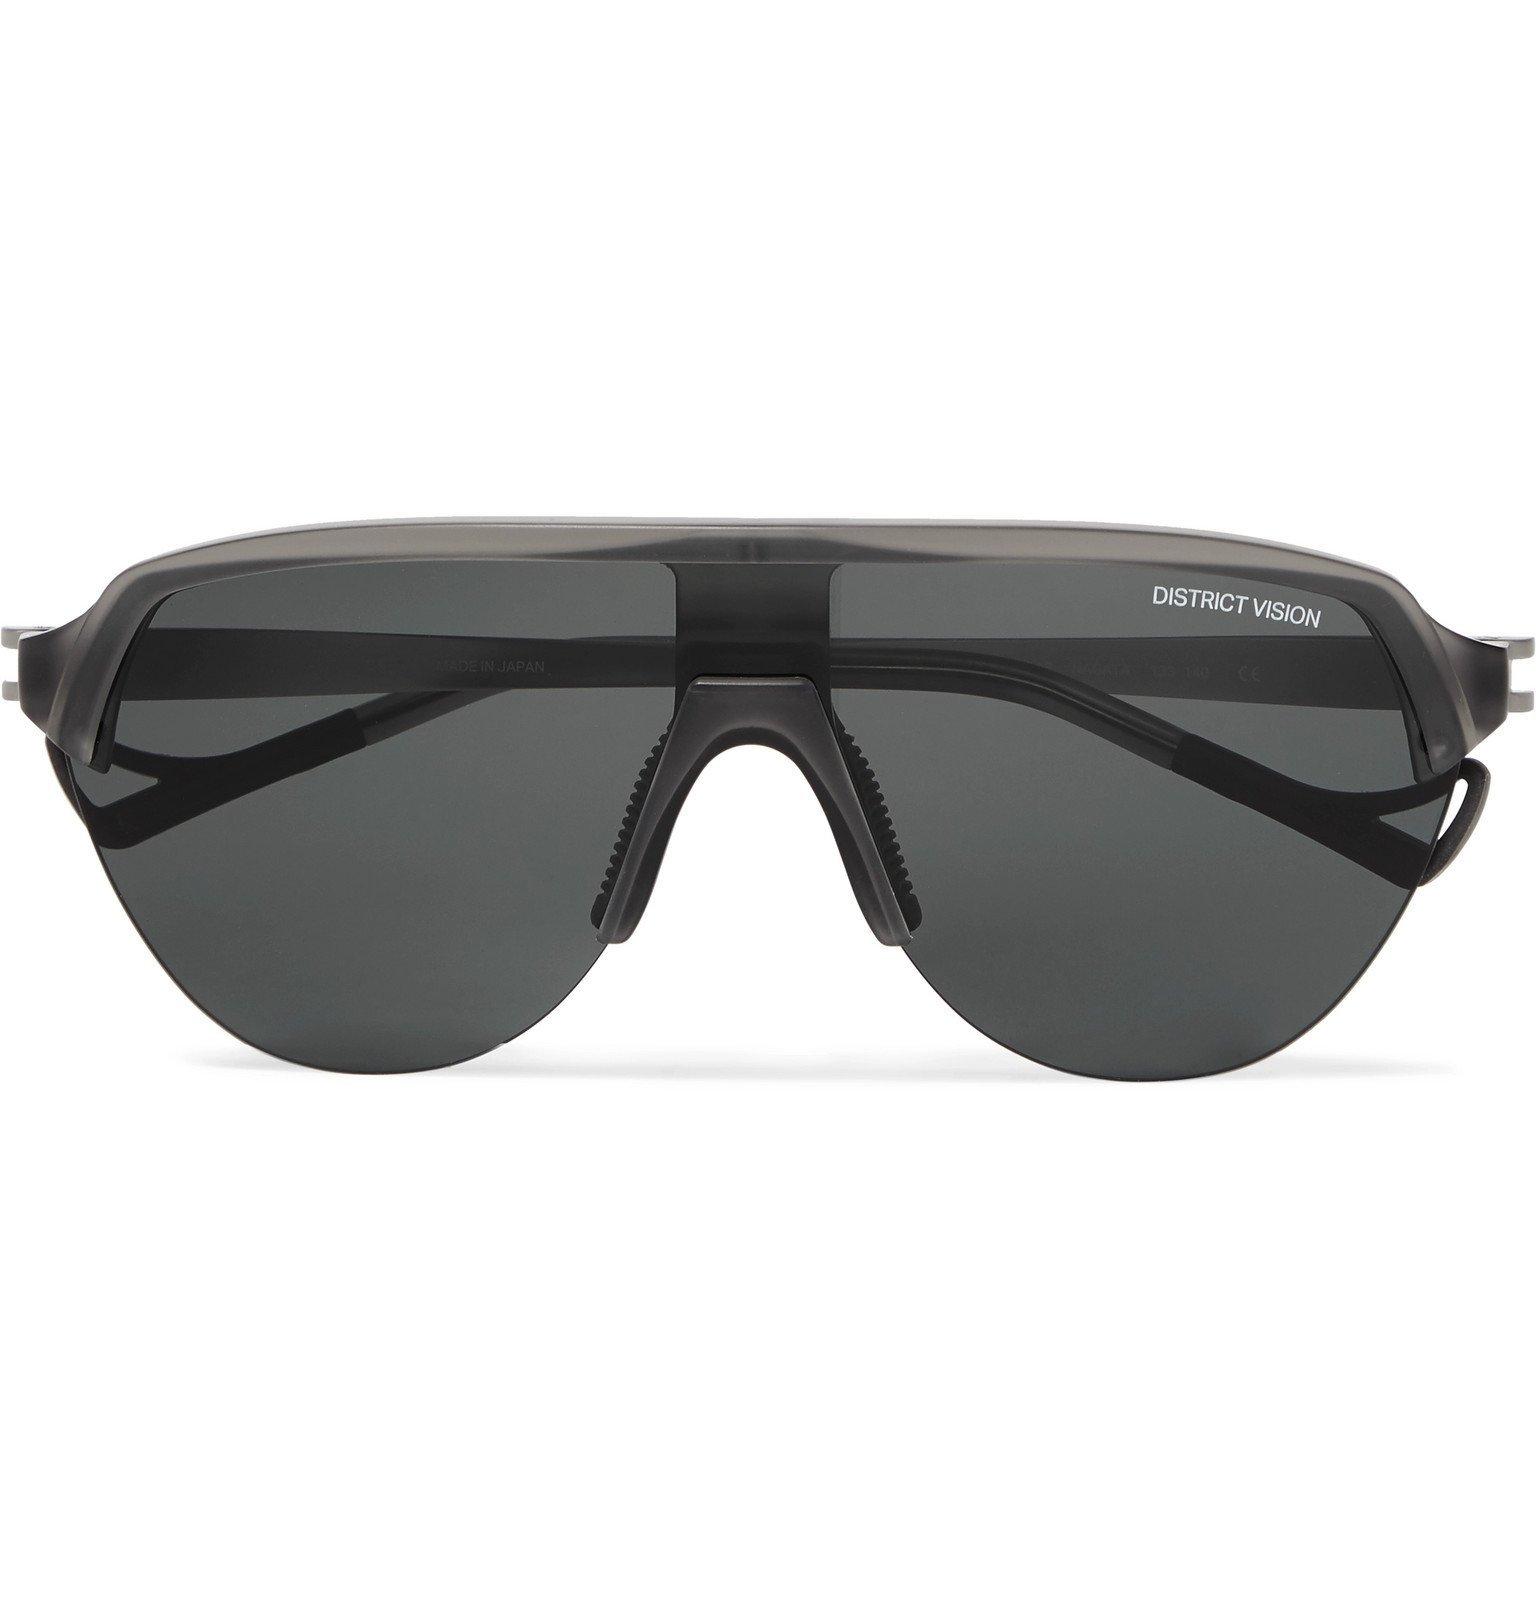 Photo: DISTRICT VISION - Nagata Speed Blade Acetate Sunglasses - Gray